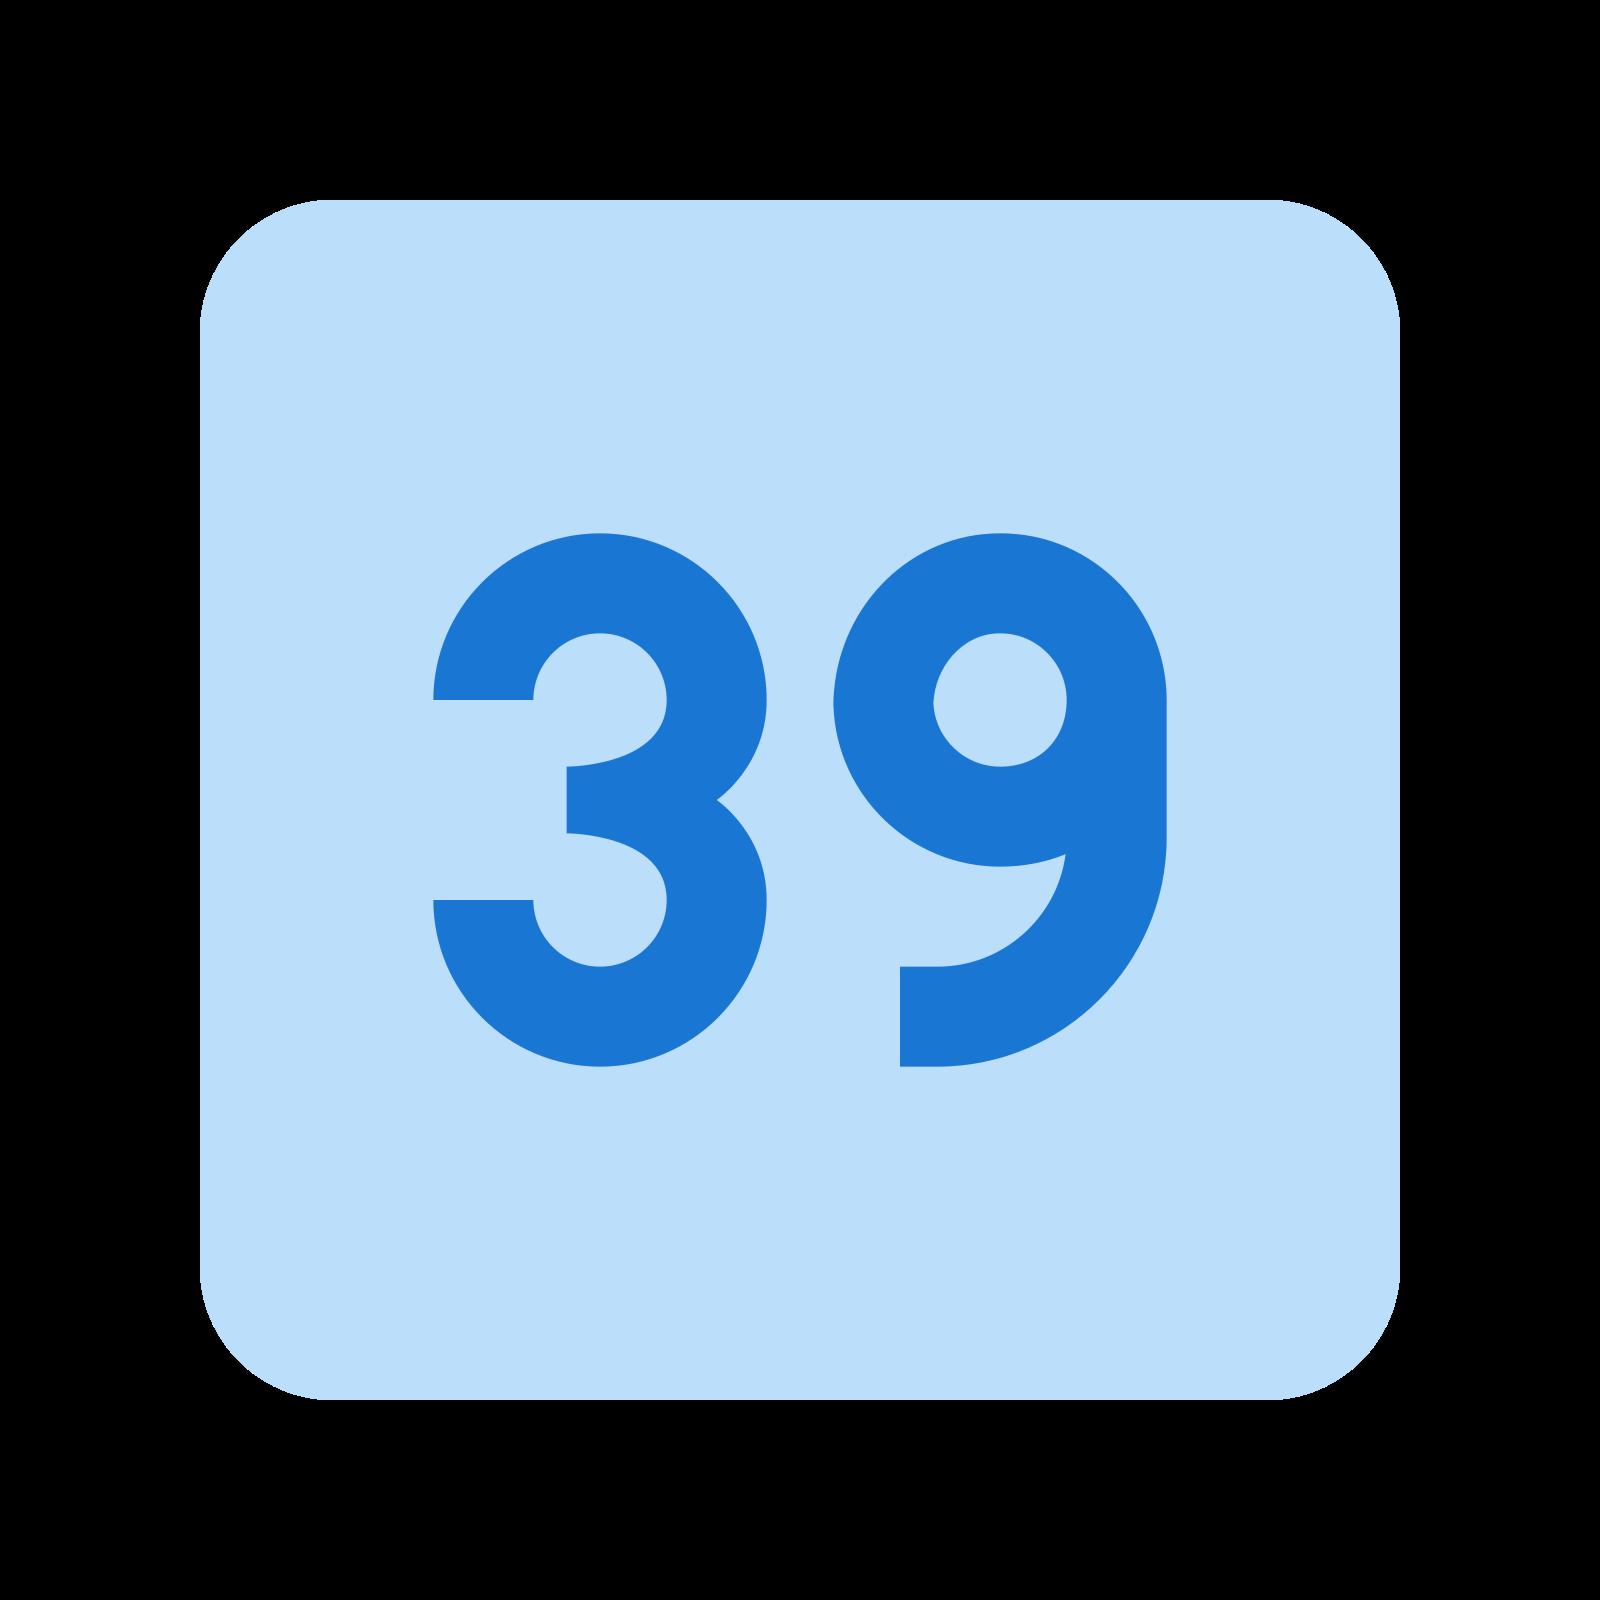 39 icon